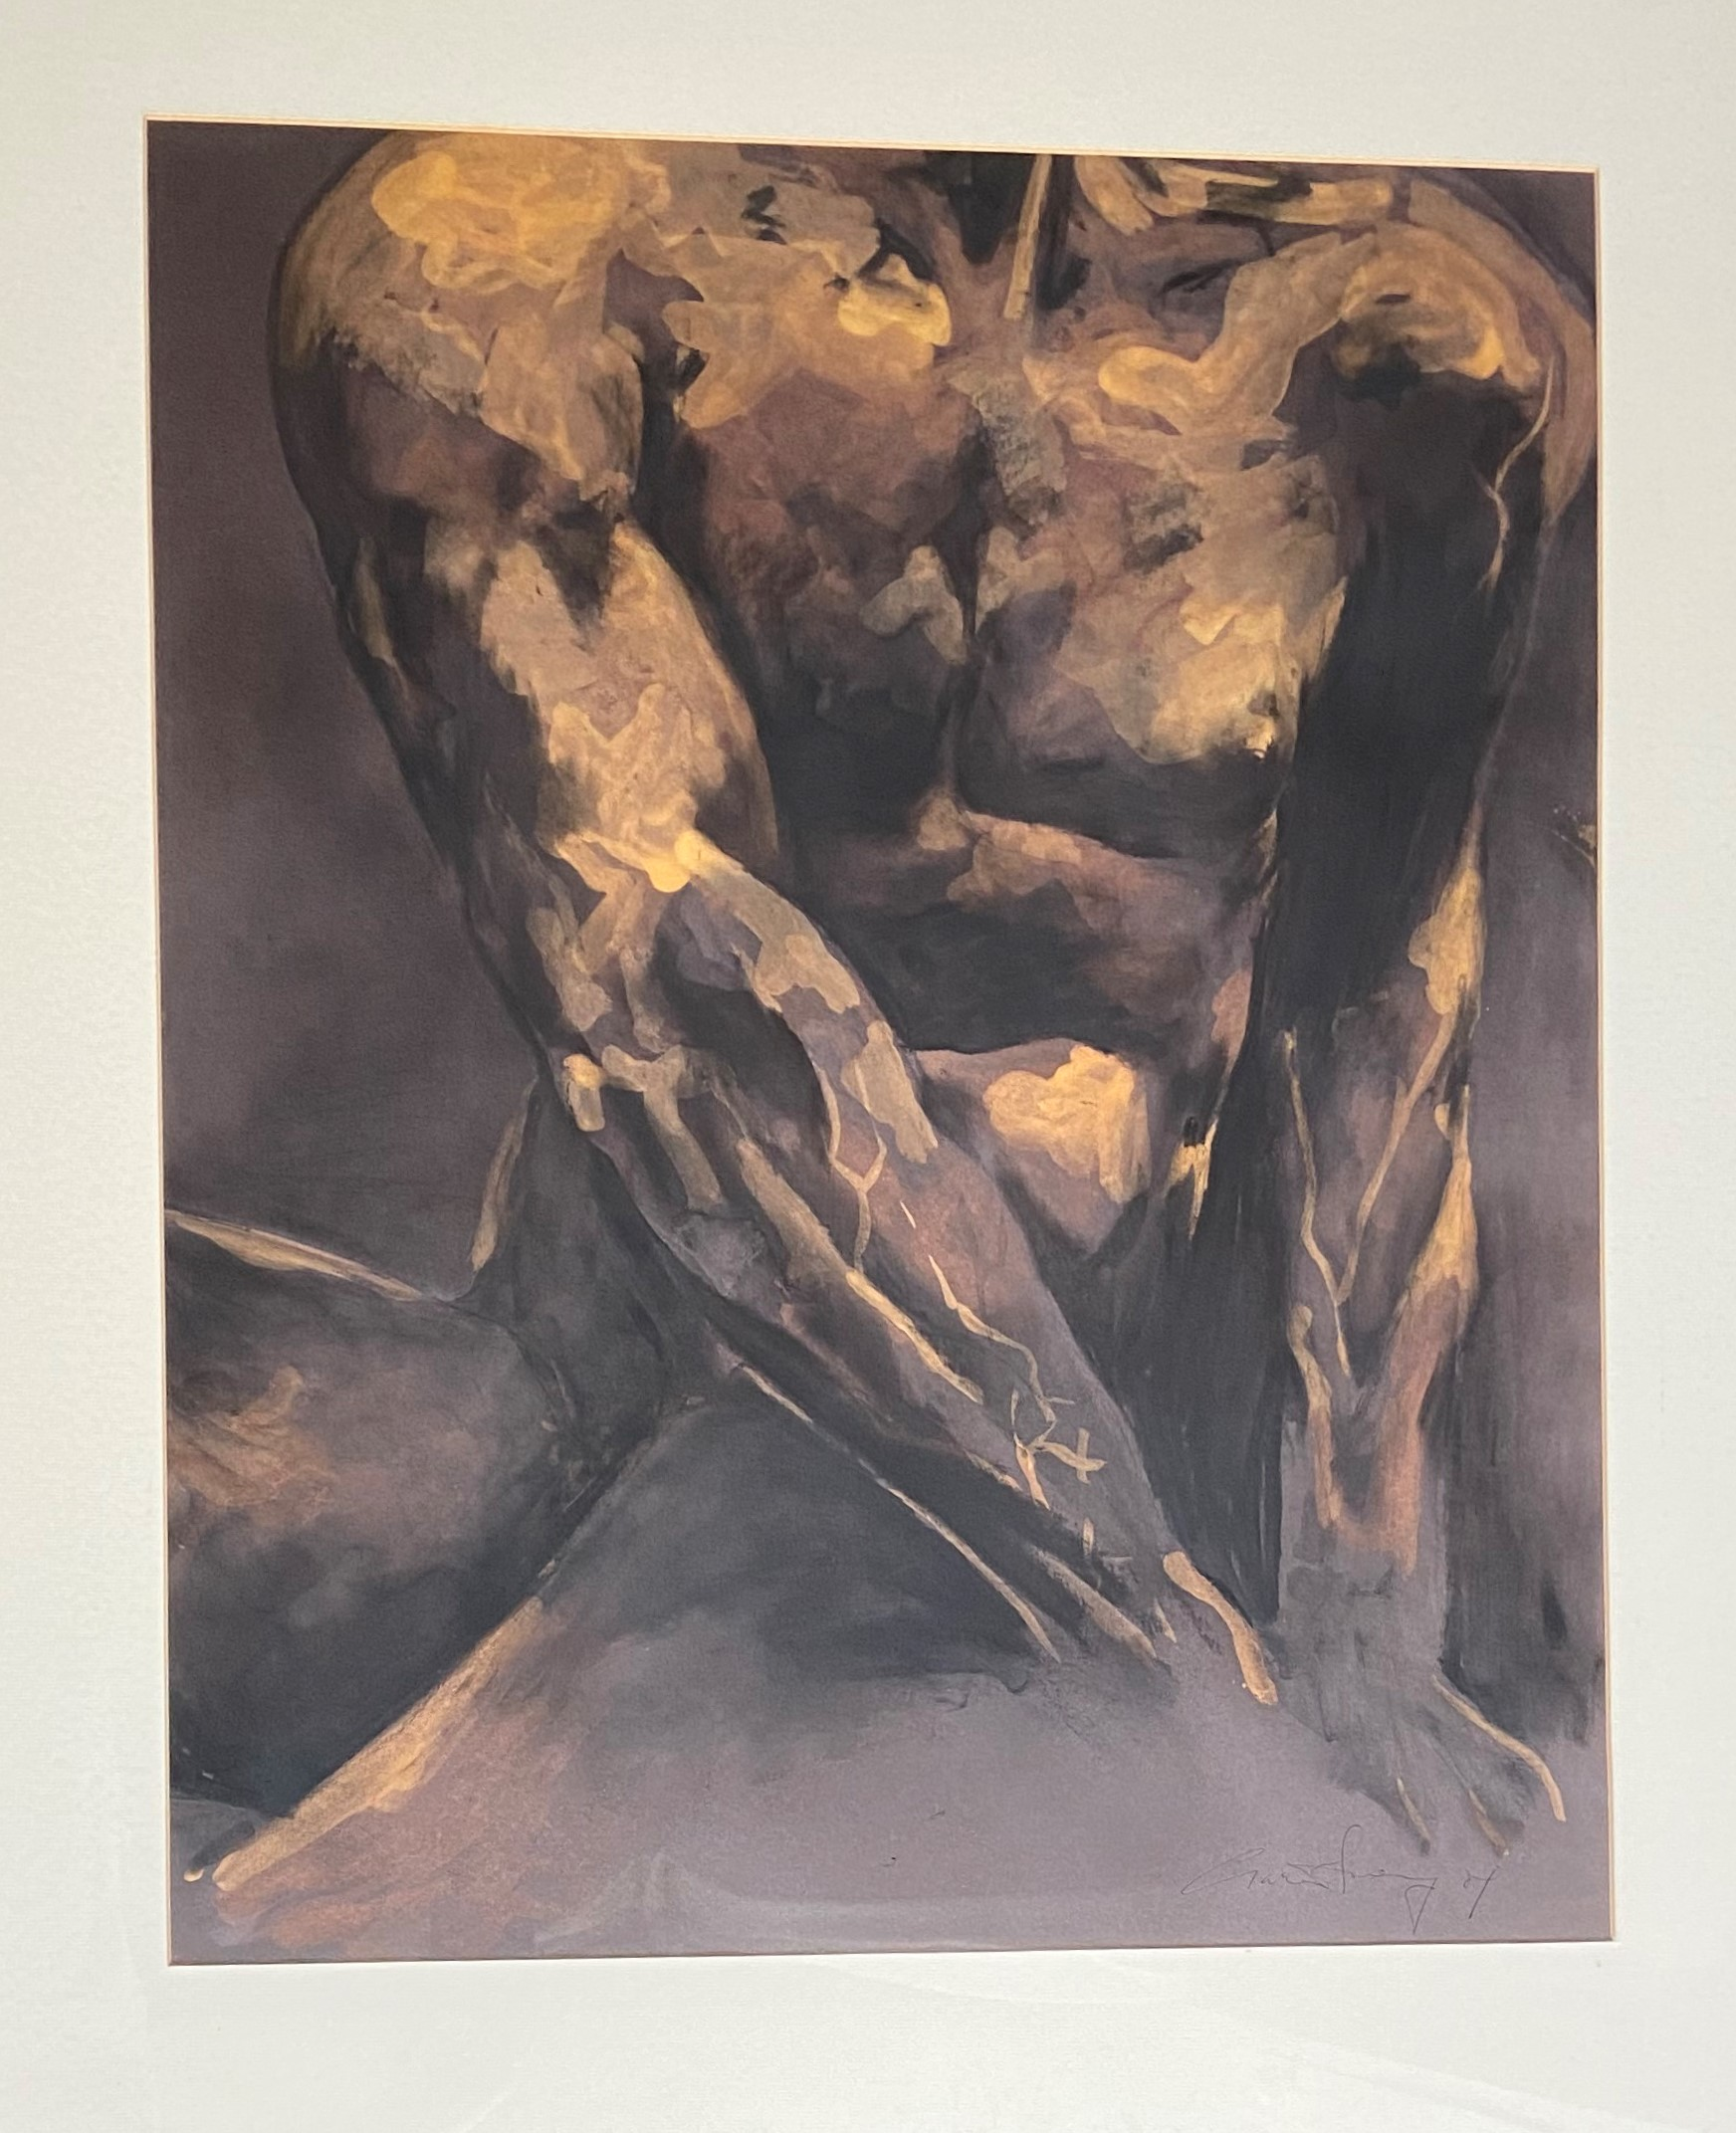 Ciaran Sweeney, 21st Century Watercolour, ''Male Torso'' indistinctly signed, 28 1/2'' x 22 1/2'' (